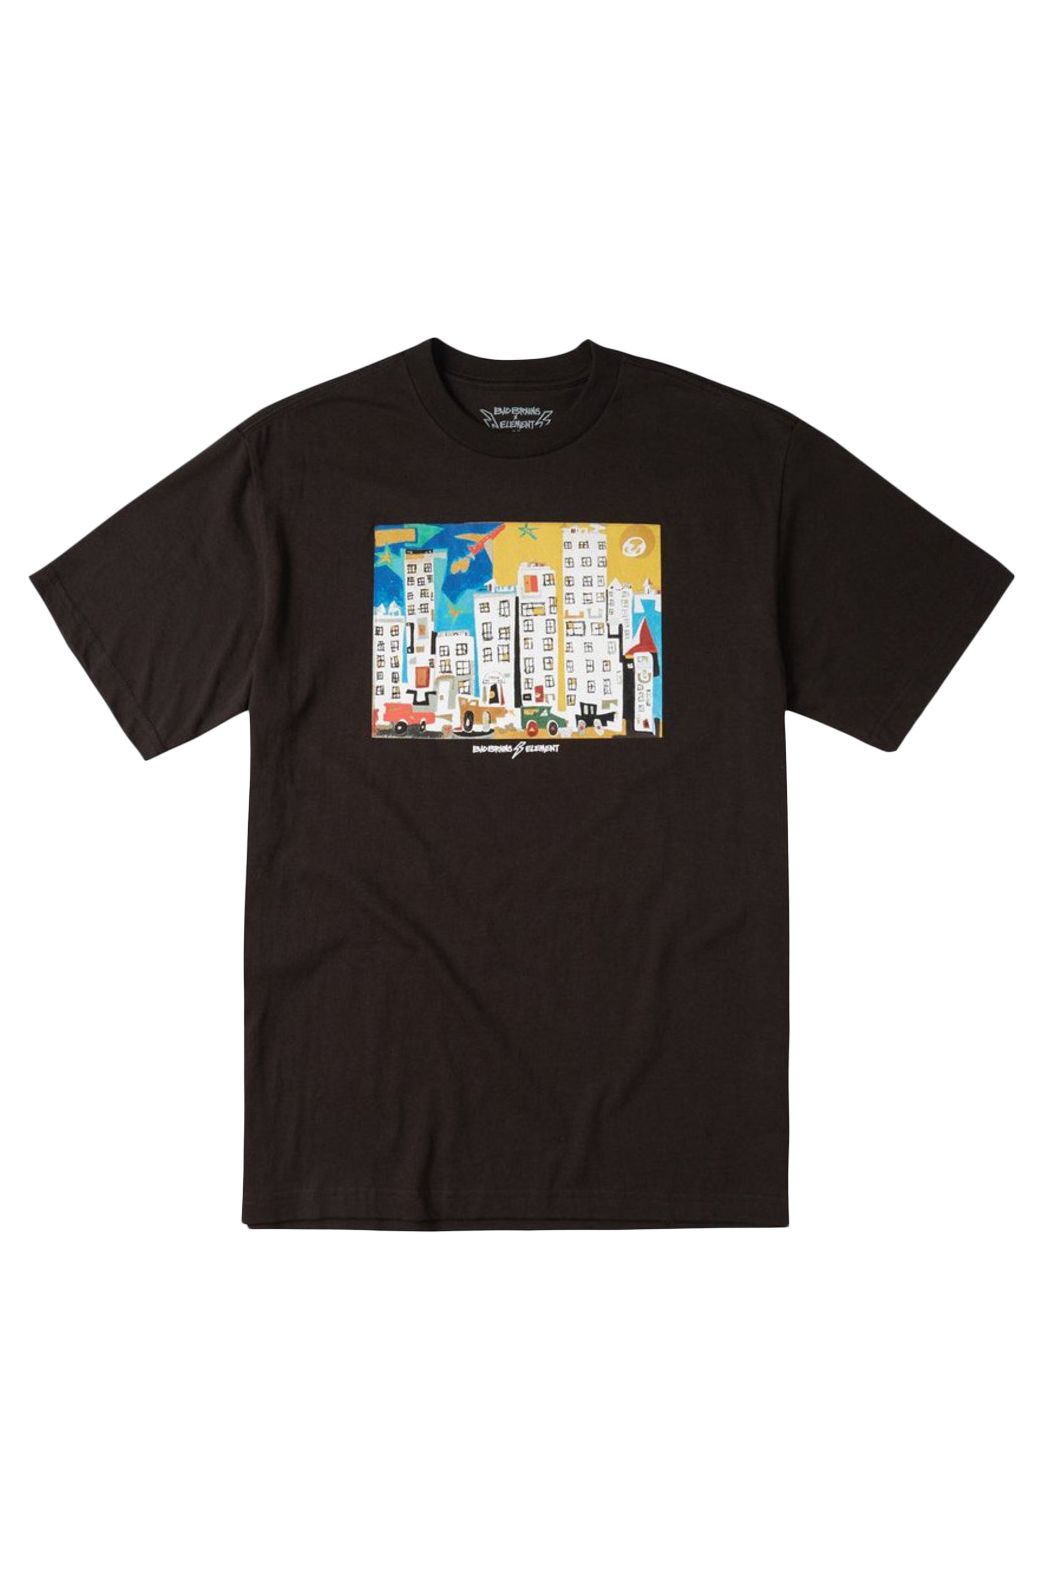 T-Shirt Element 315 BAD BRAINS Flint Black